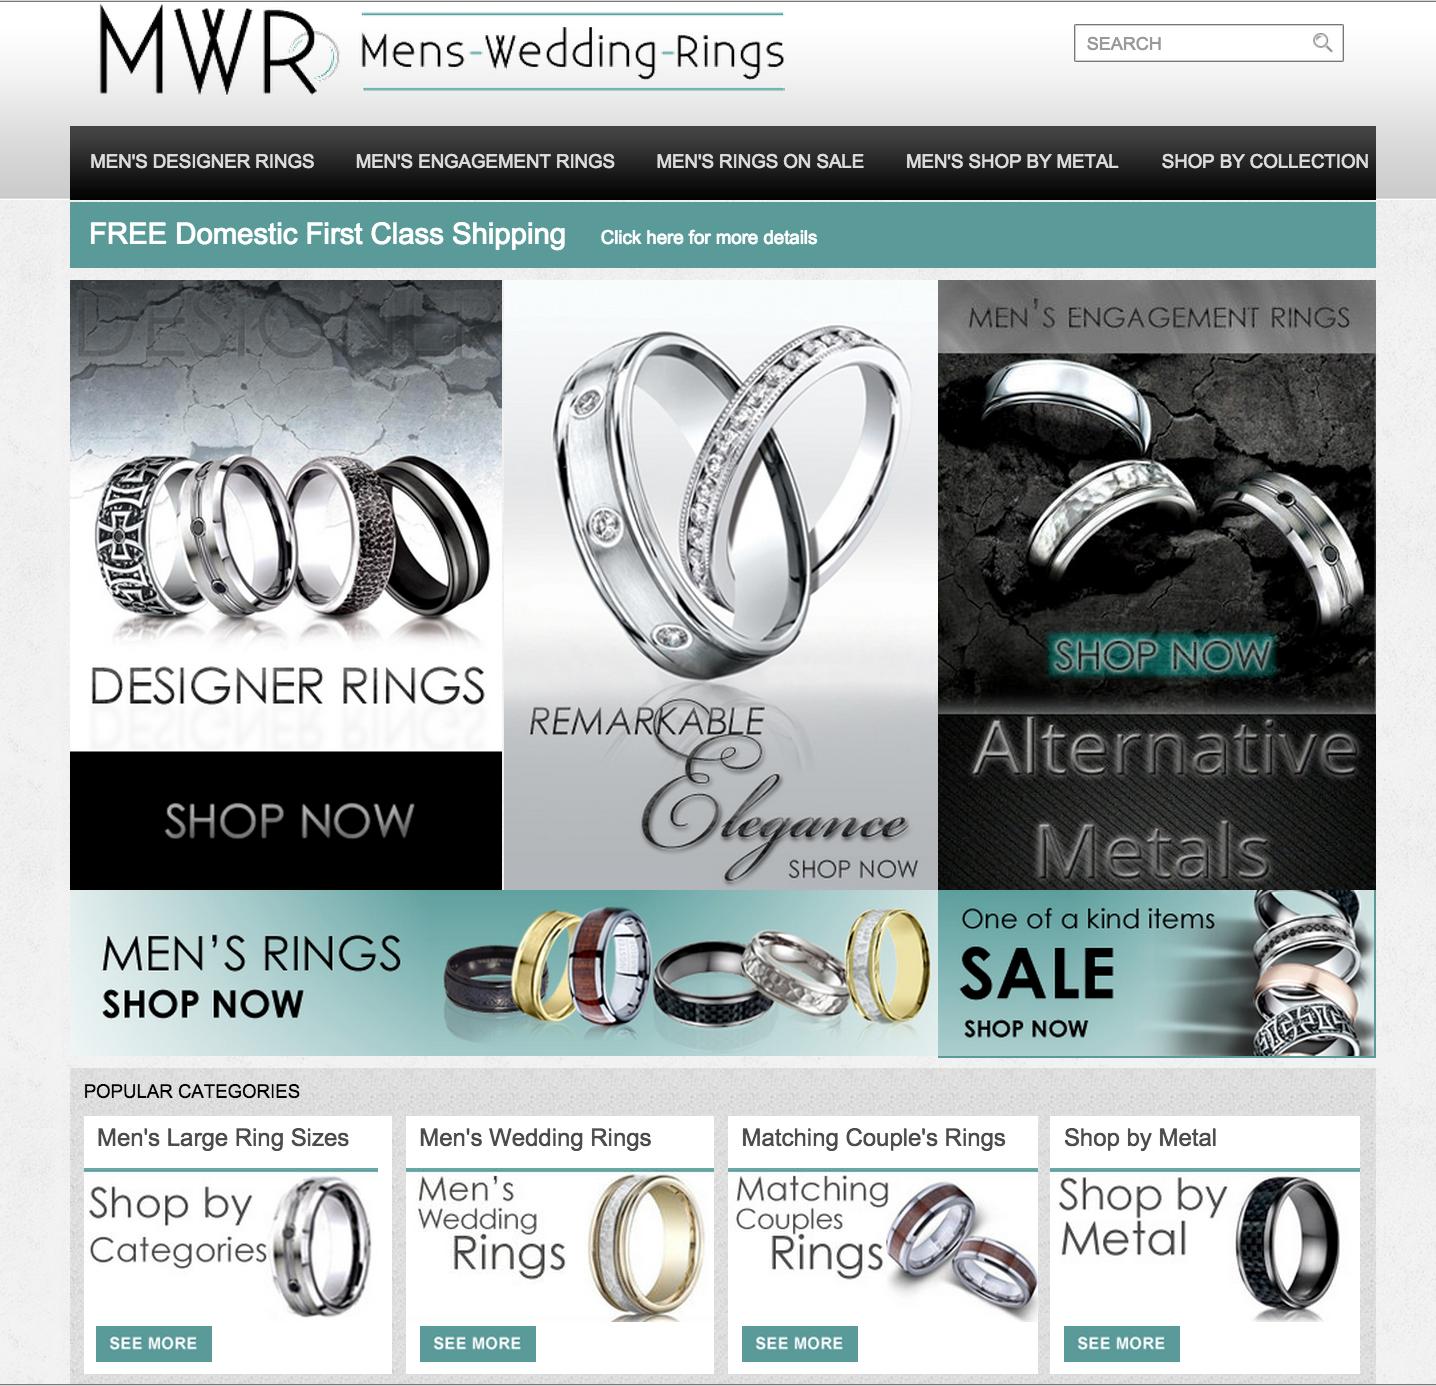 Mens-Wedding-Rings.com